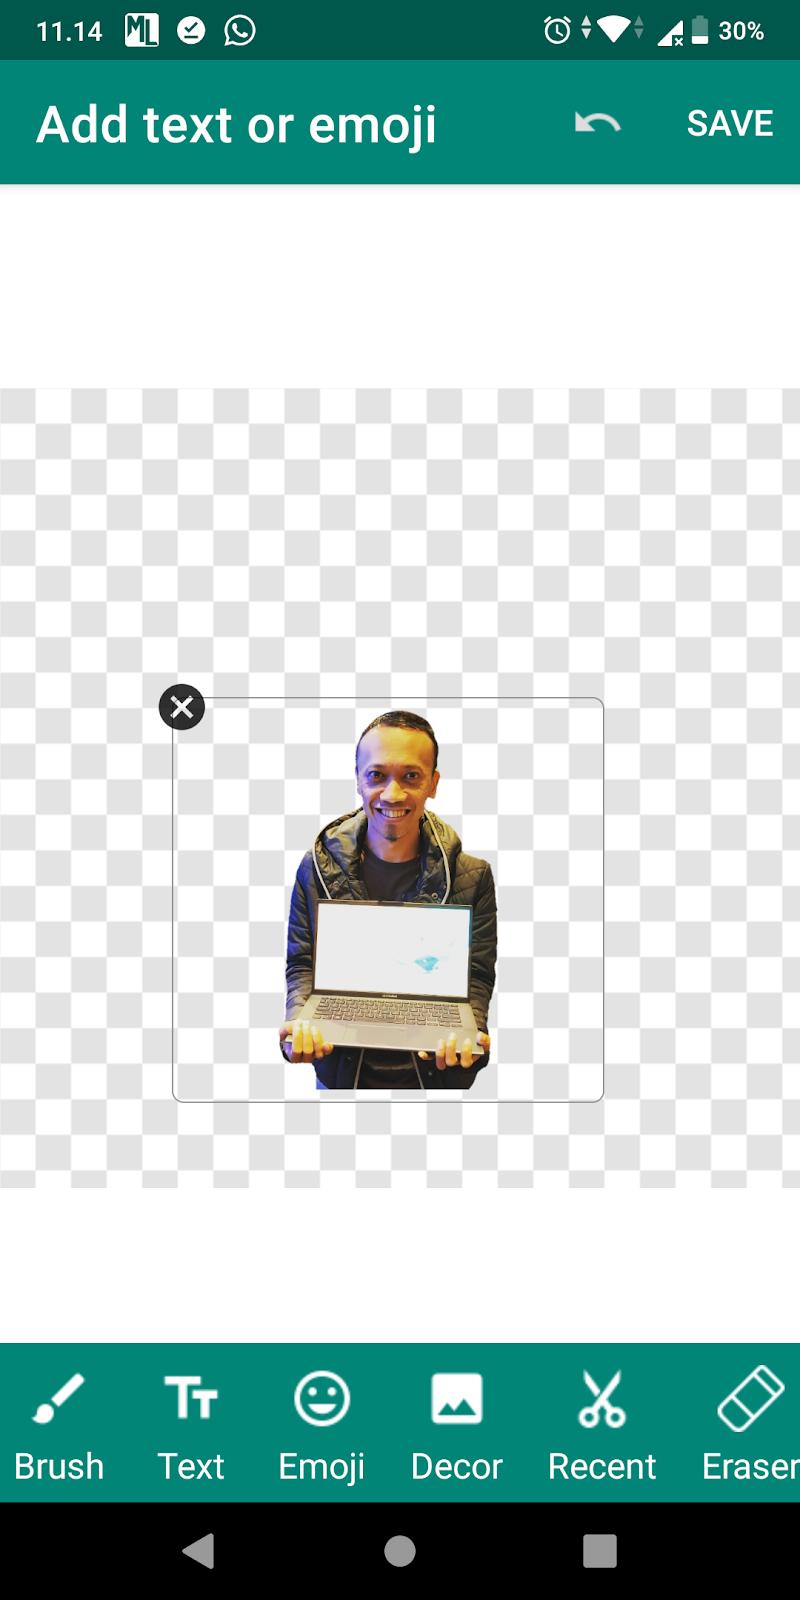 Cara Membuat Stiker Whatsapp Foto Wajah Sendiri Aplikasi Hp Android